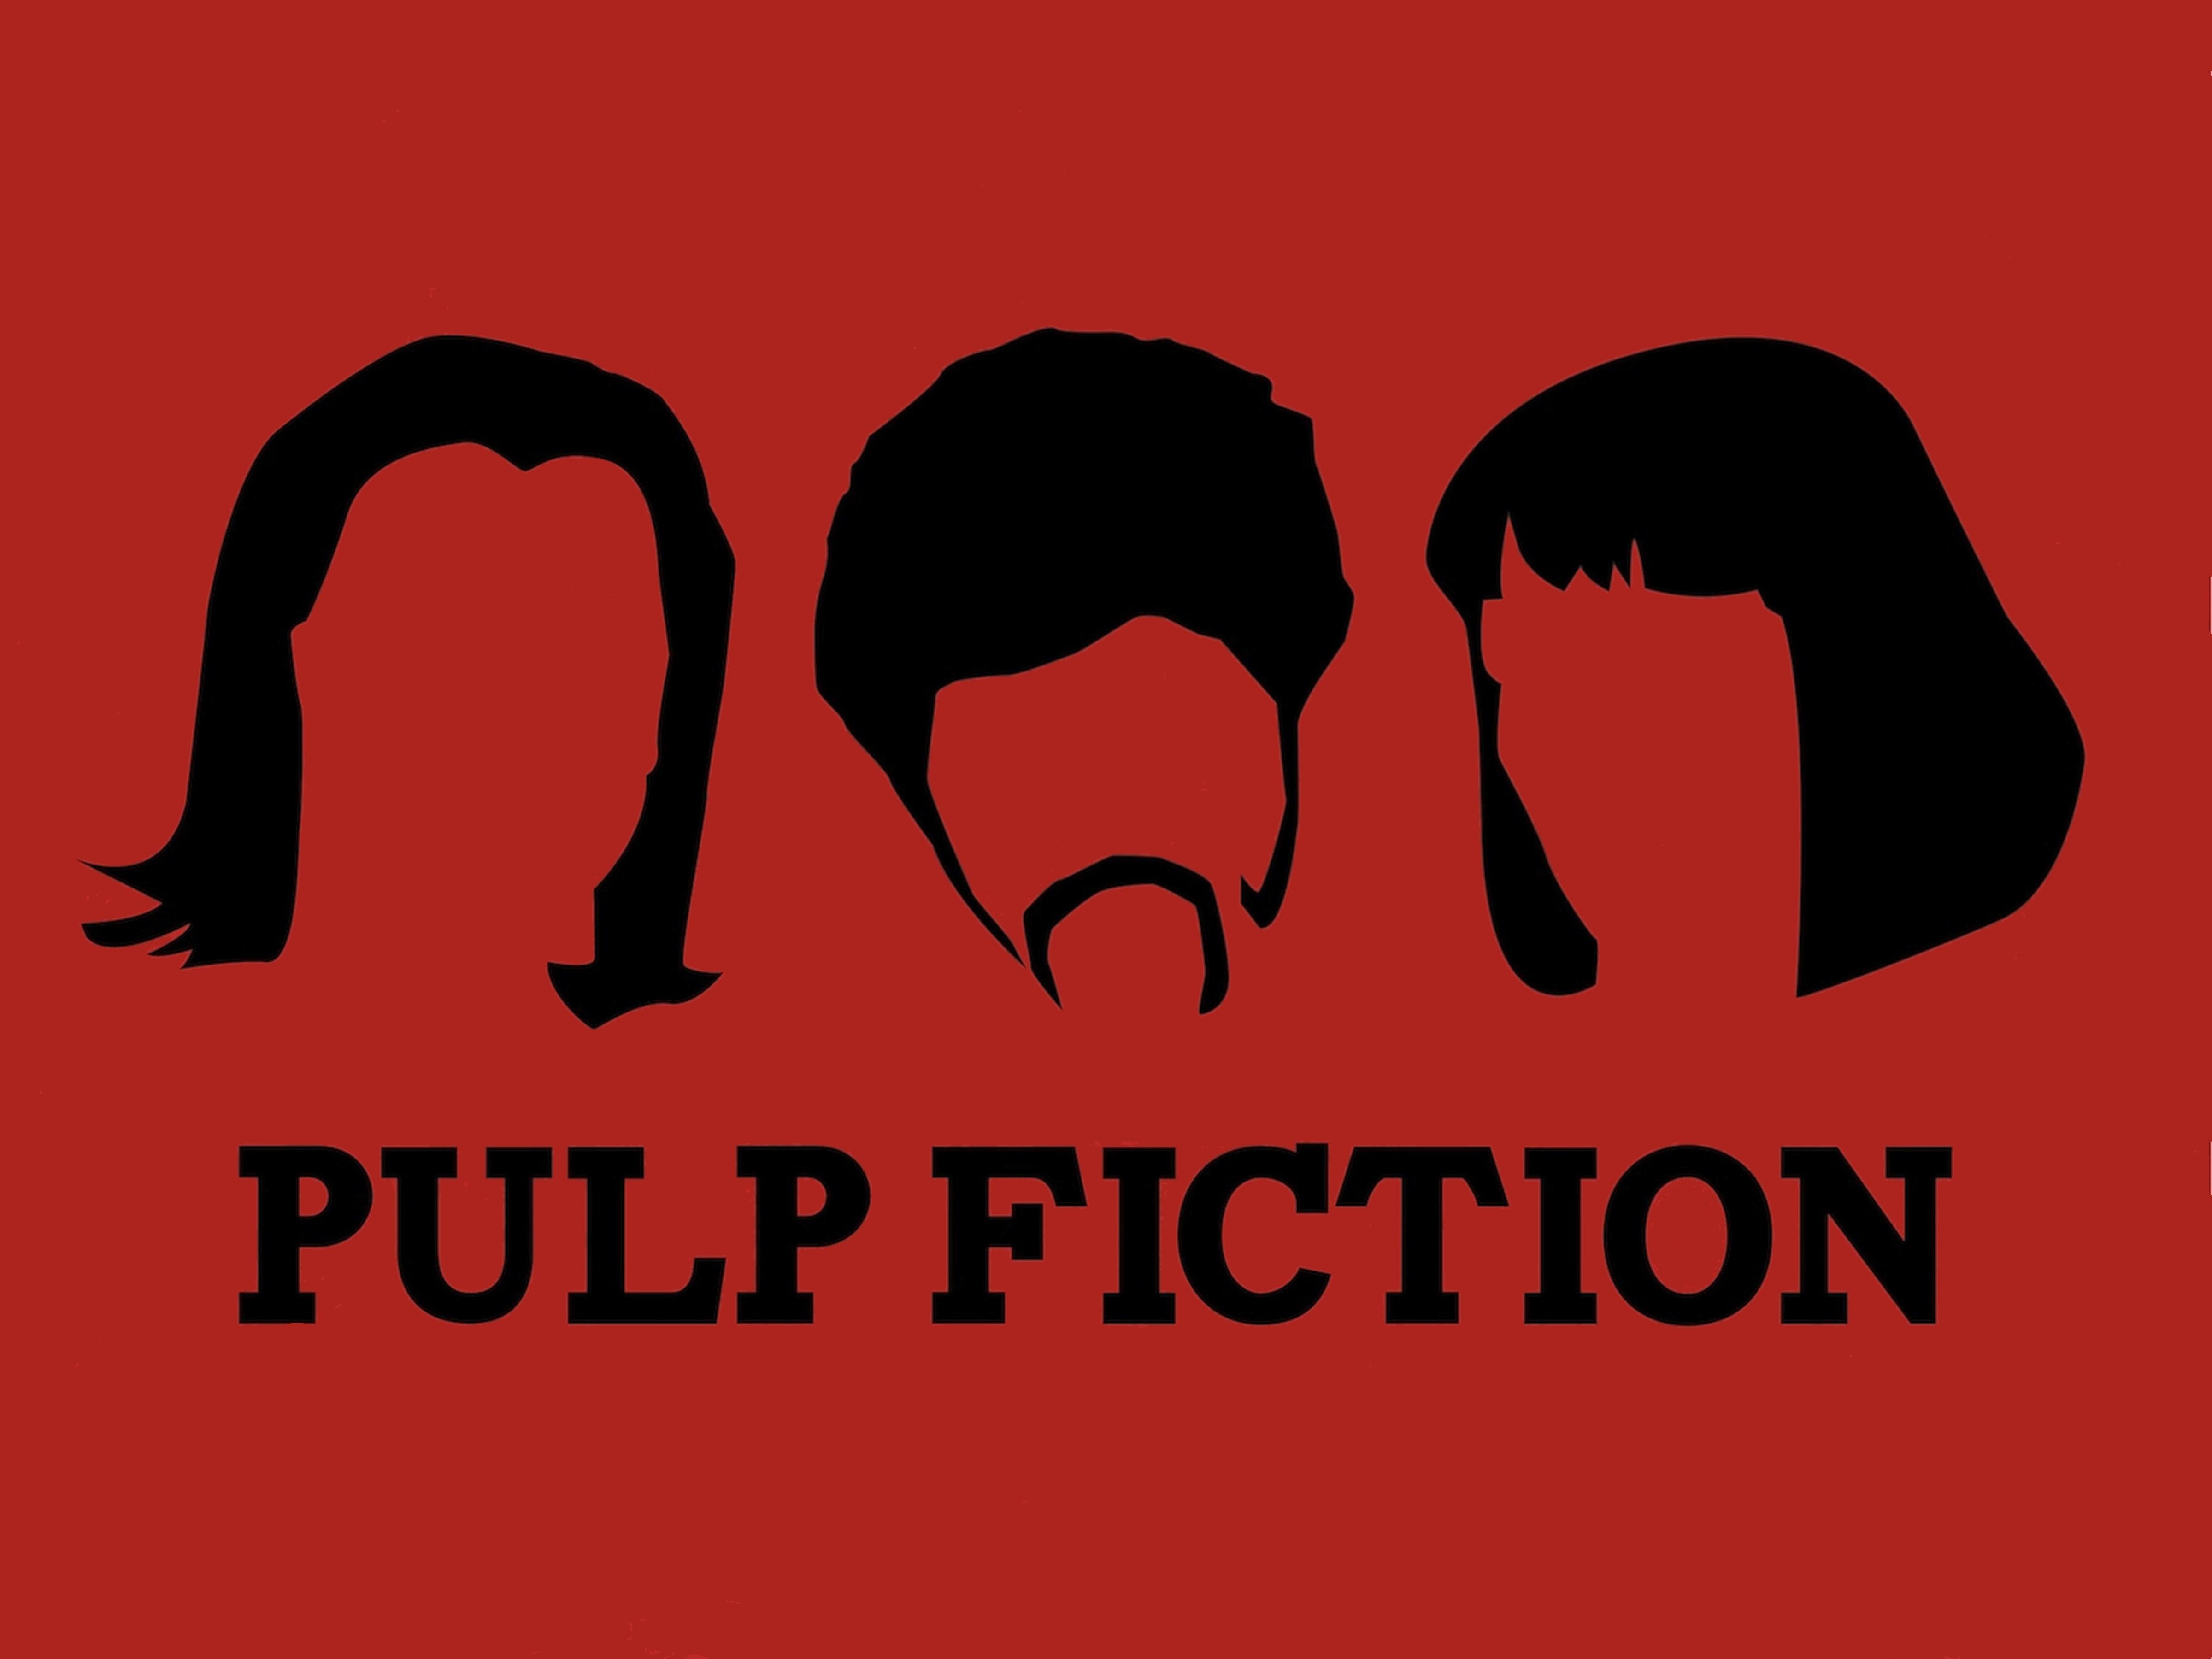 Pulp fiction computer wallpapers desktop backgrounds - Pulp fiction iphone wallpaper ...